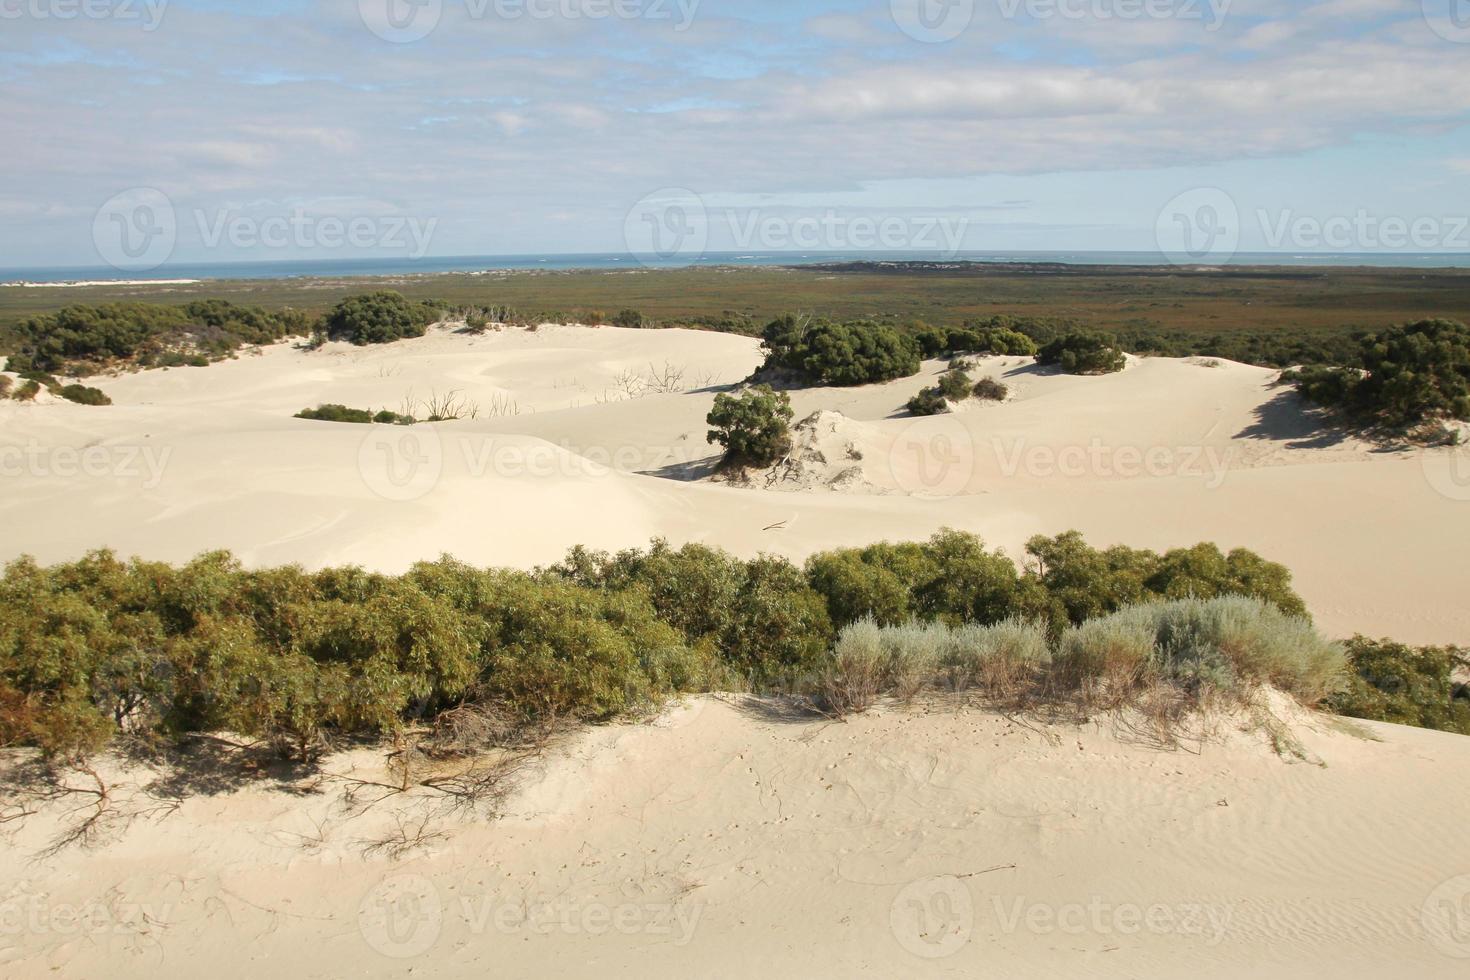 de woestijn foto